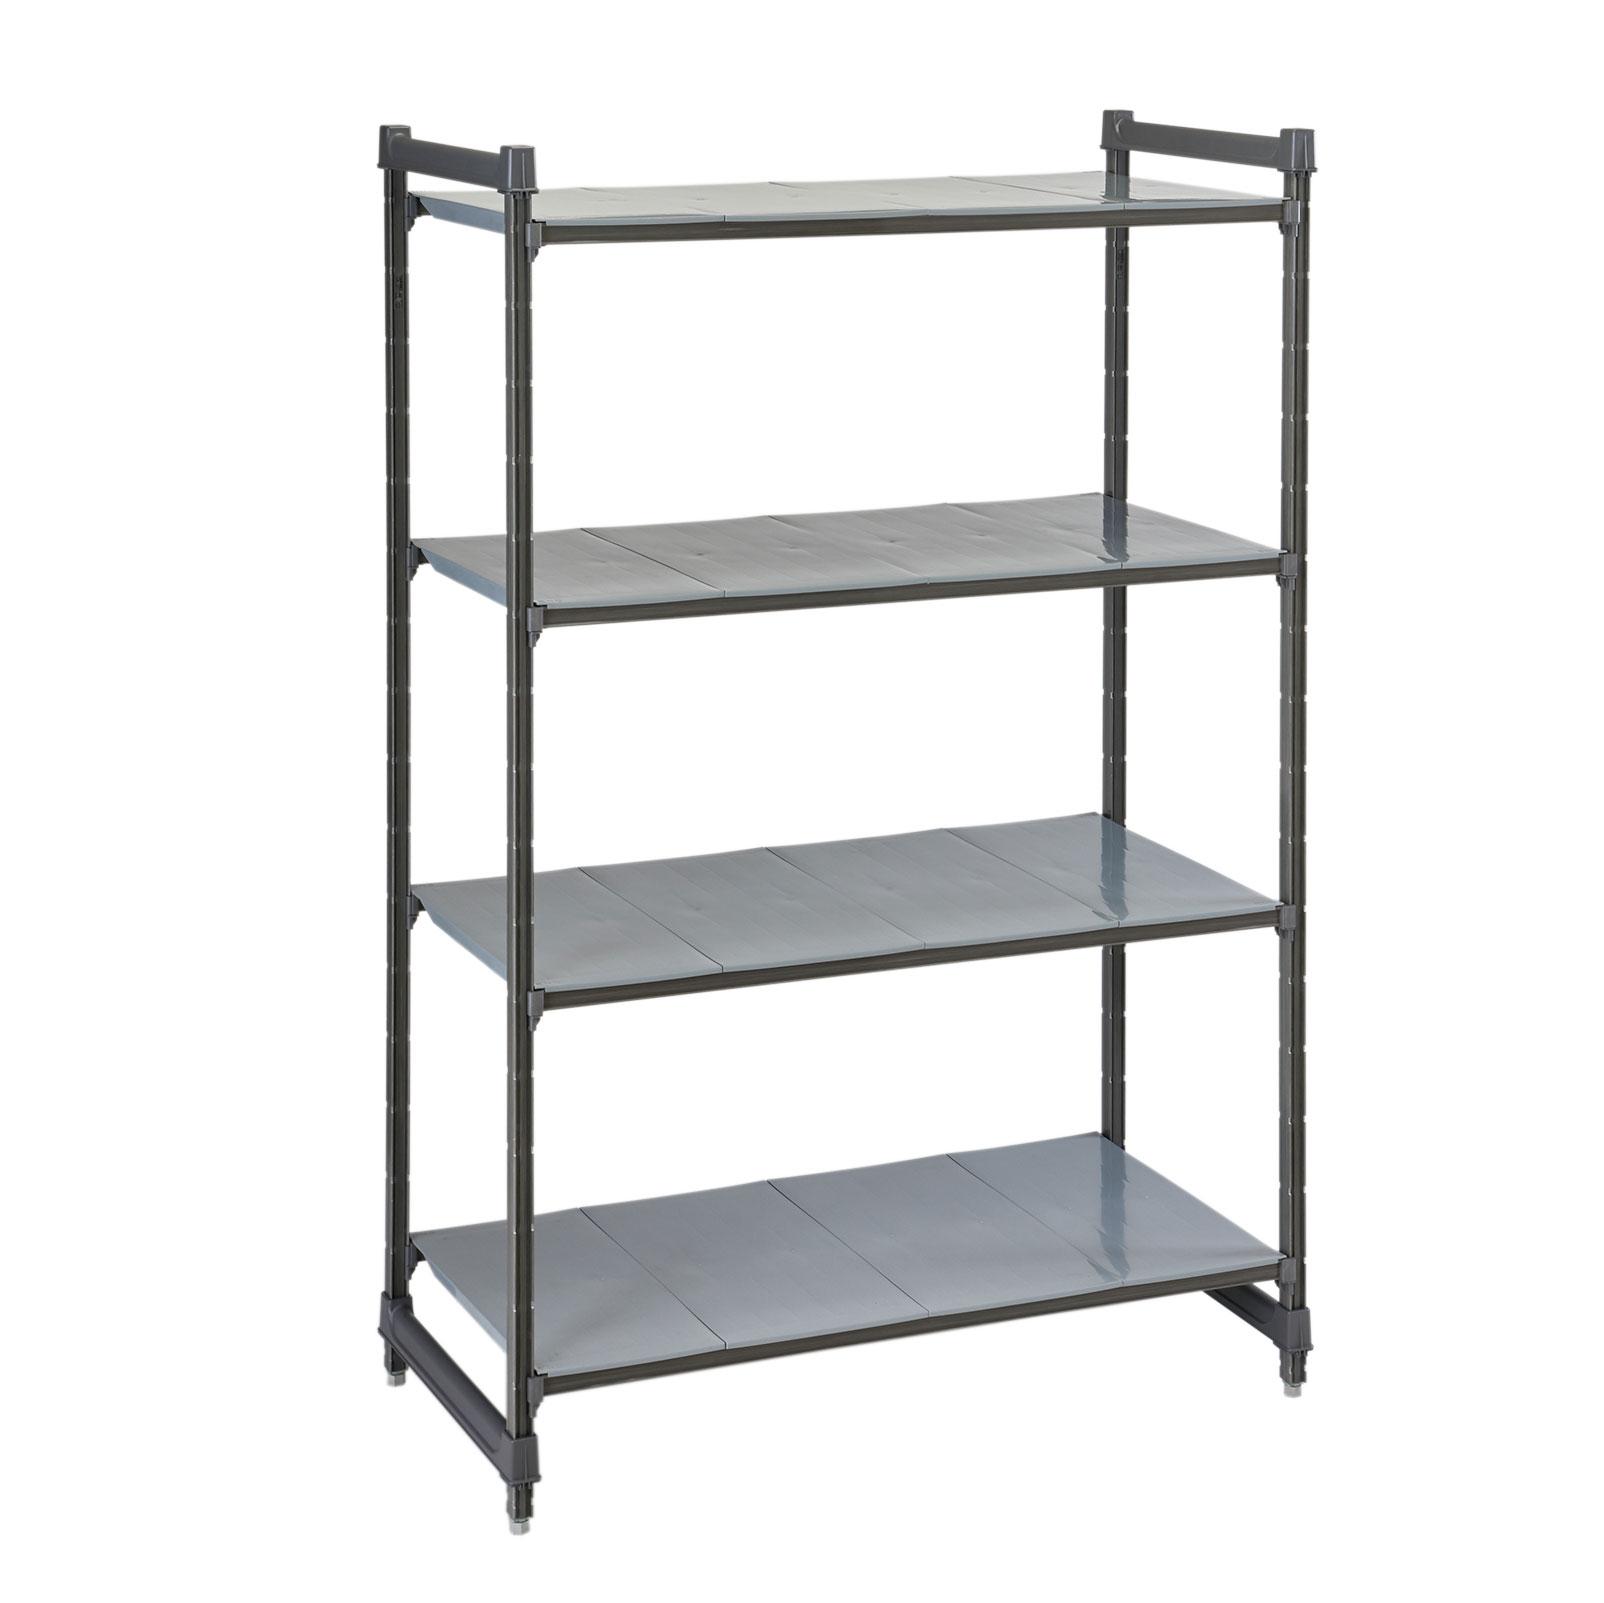 Cambro CBU183664S4580 shelving/shelving systems